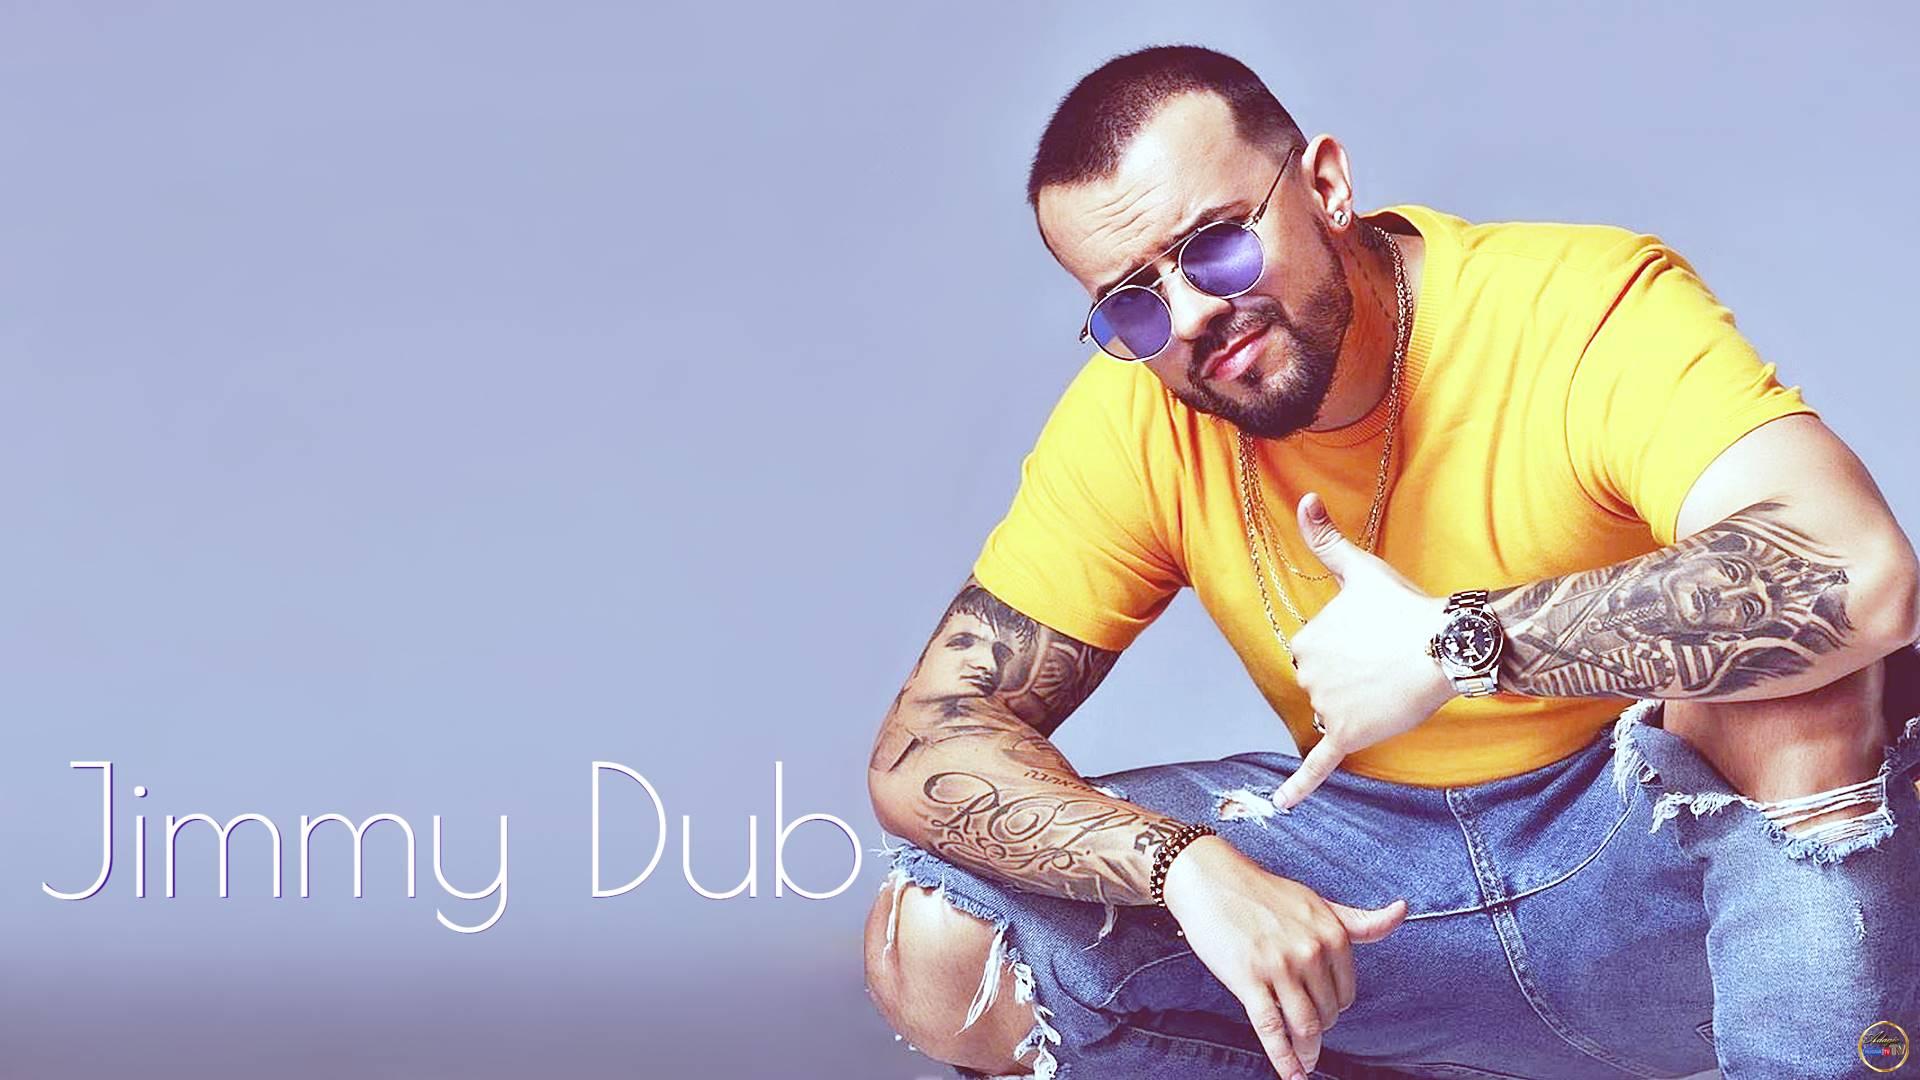 Jimmy Dub